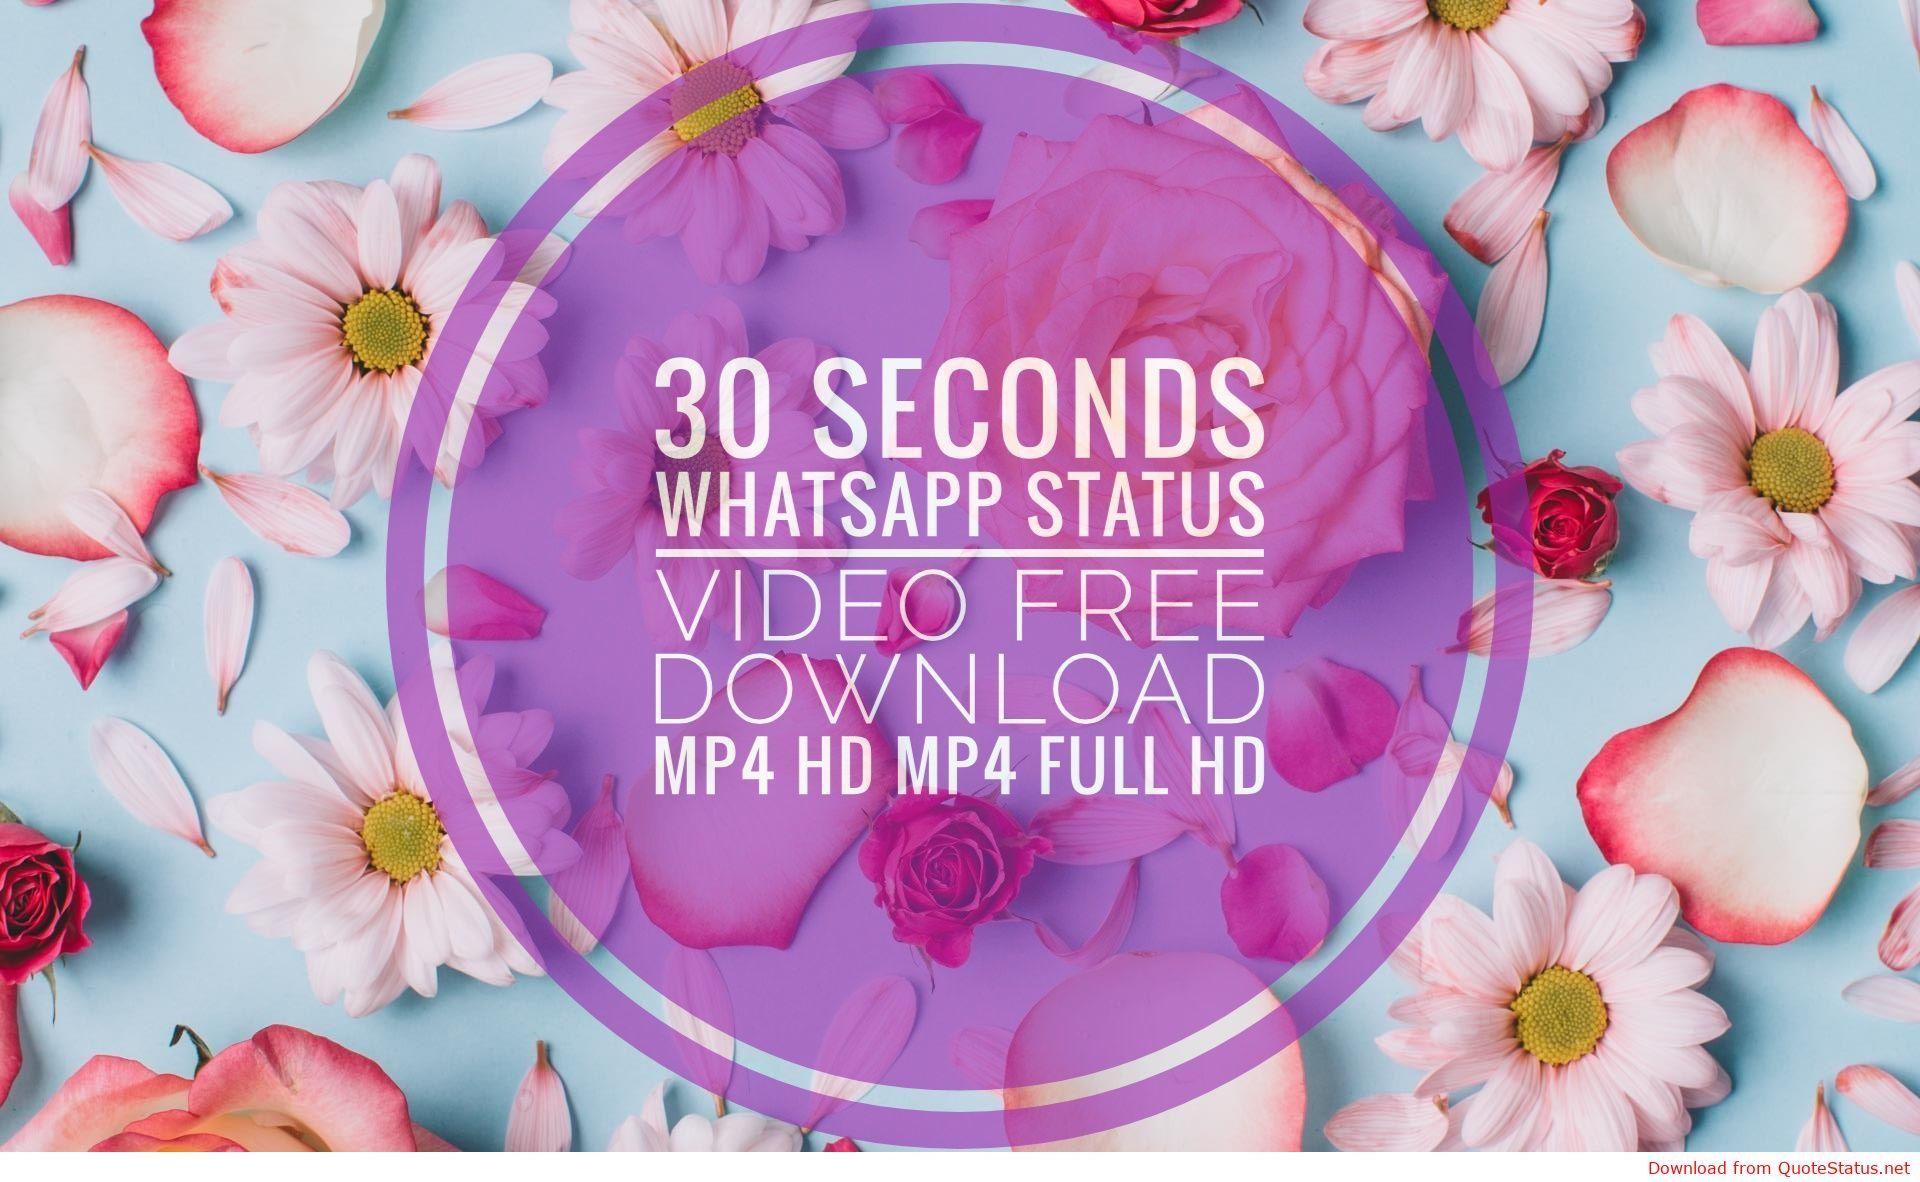 30 seconds whatsapp status video free download mp4 hd mp4 ...